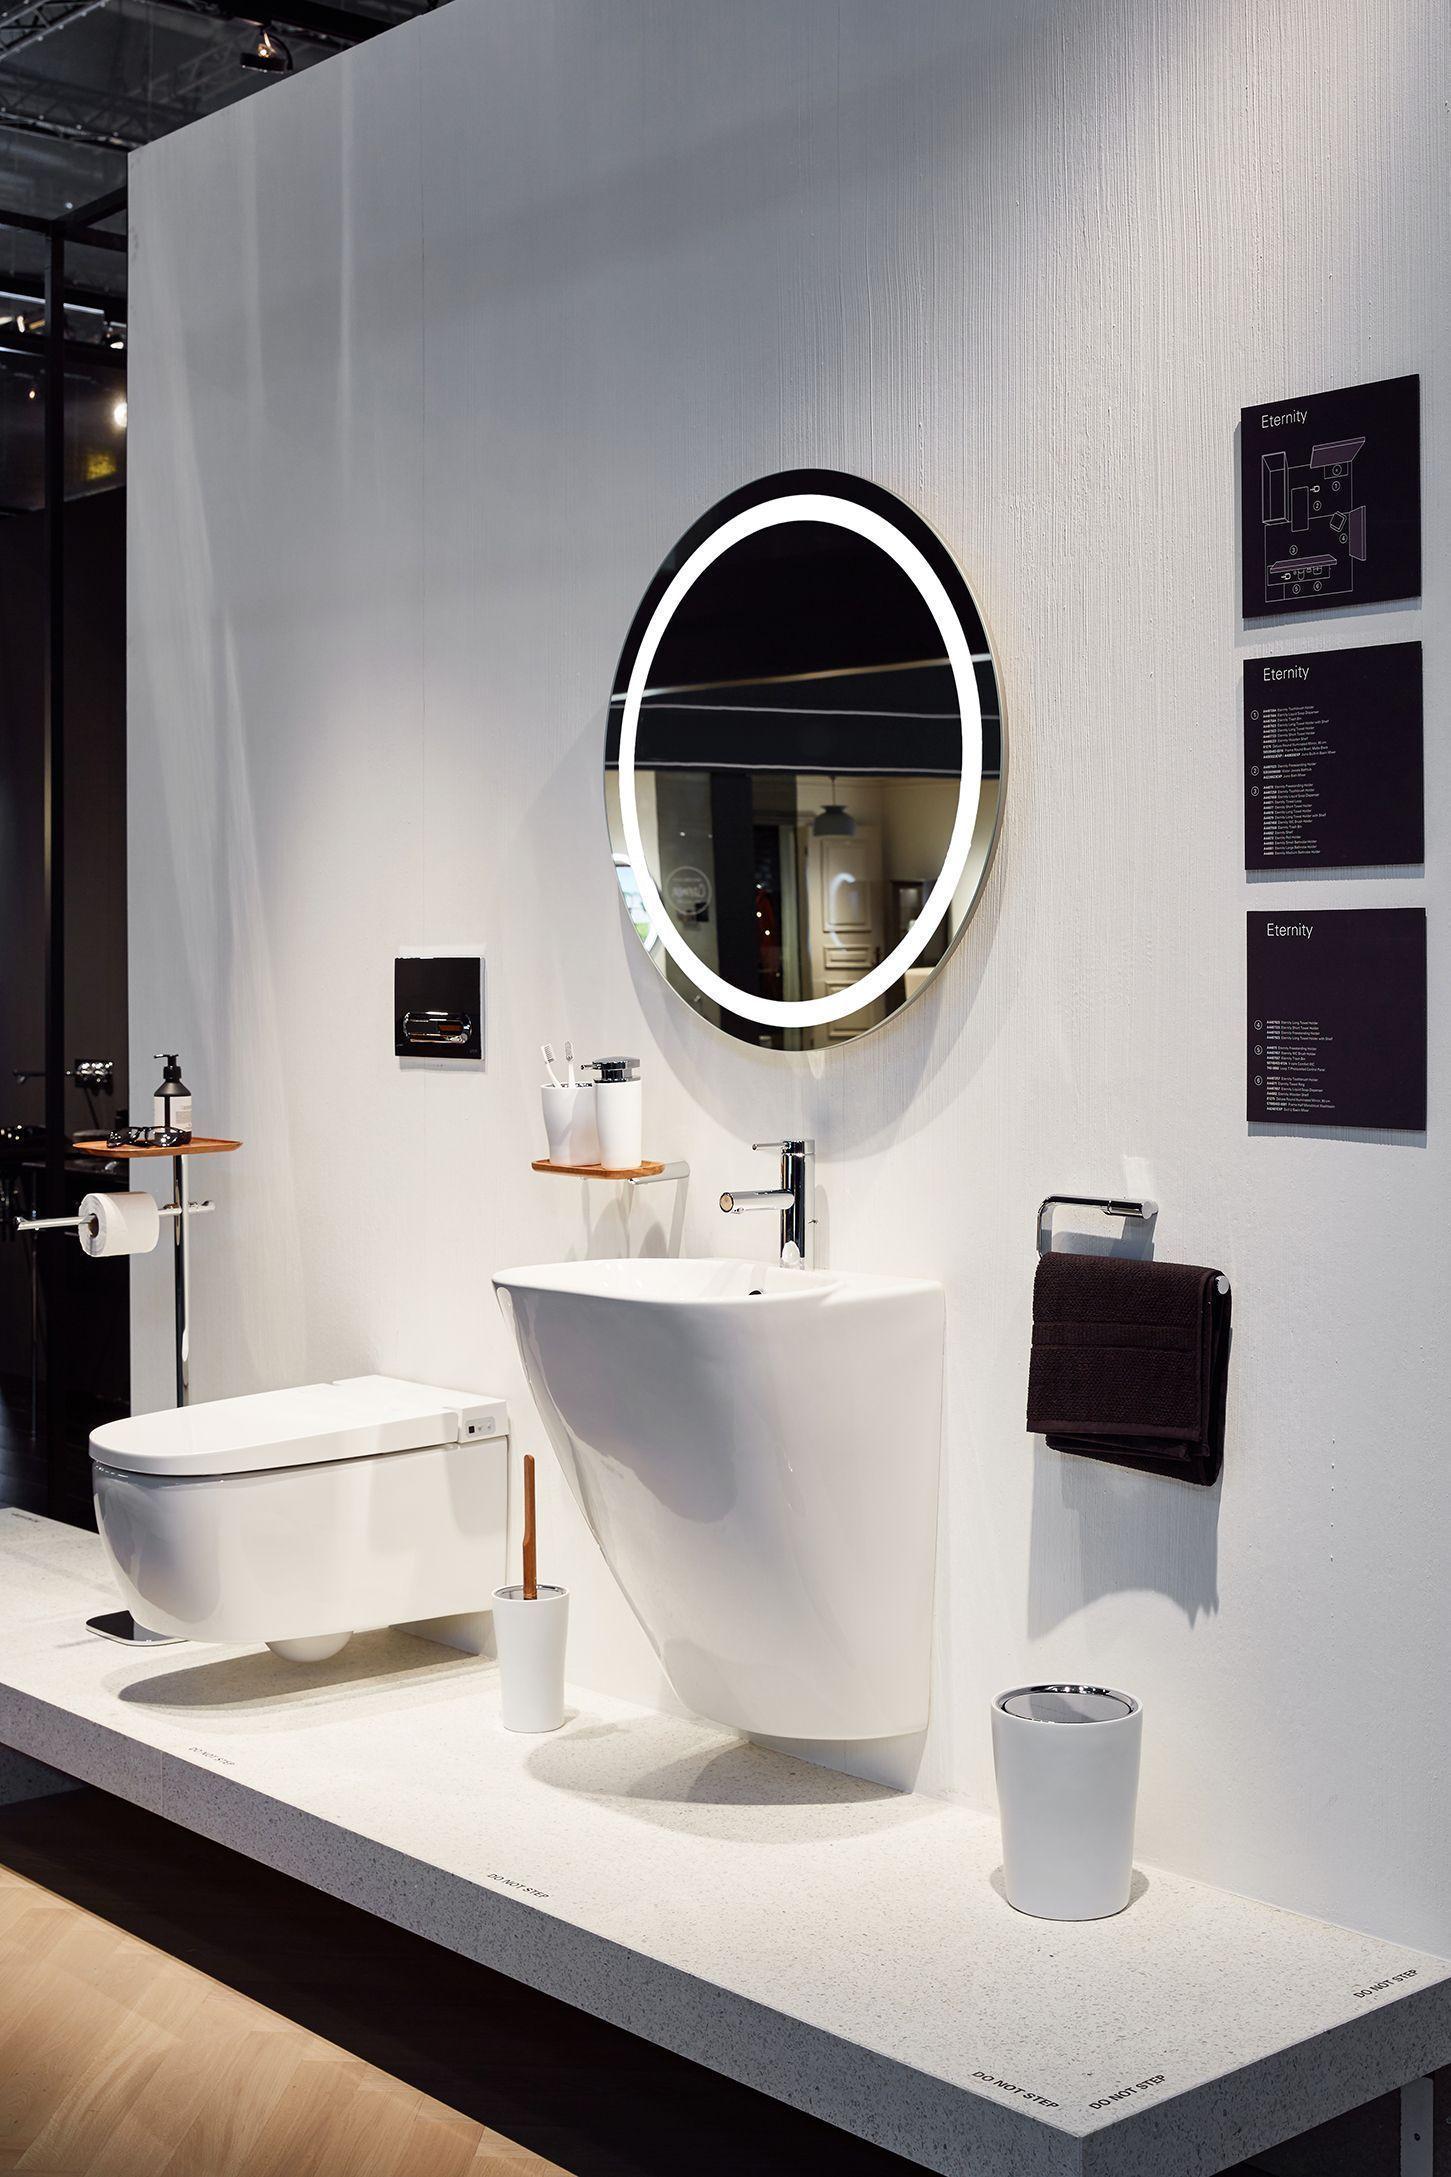 Vitra Ish Frankfurt 2017 Bathroomshowrooms Luxurybathroomexdisplay Stylish Bathroom Bathroom Showrooms Modern Bathroom